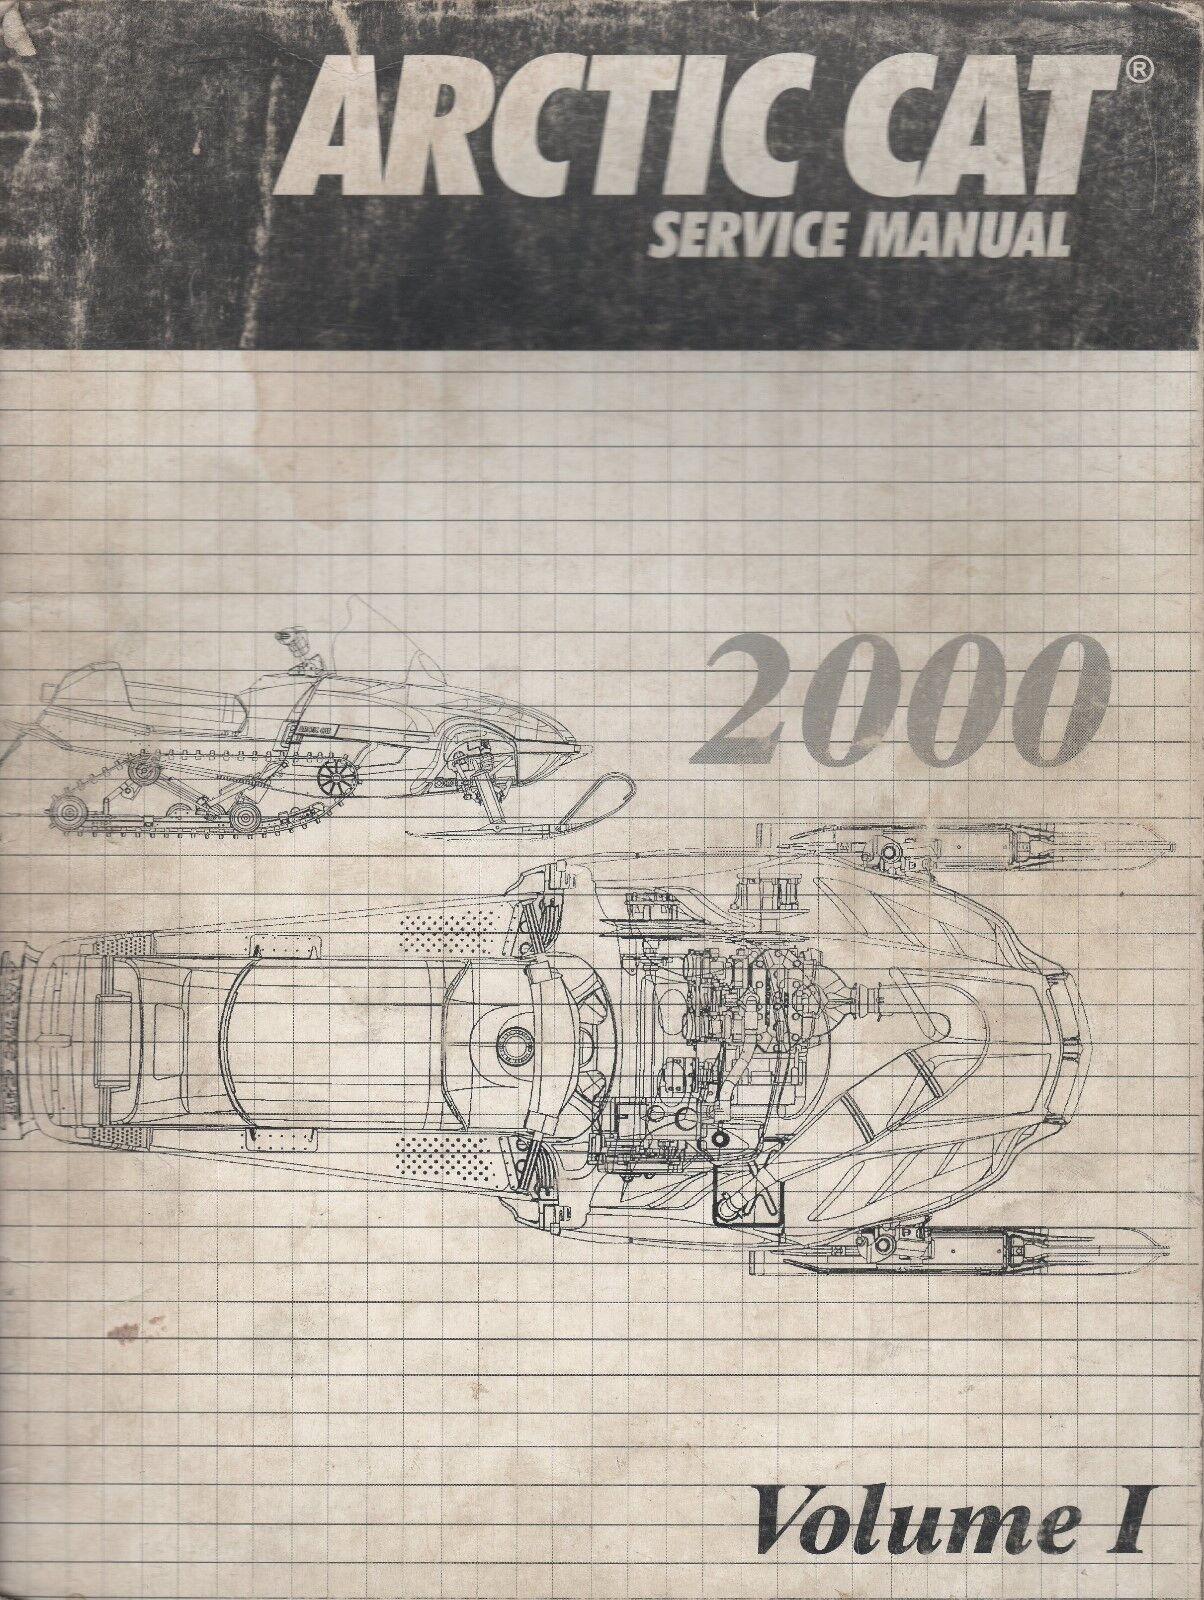 2000 ARCTIC CAT SNOWMOBILE SERVICE MANUAL VOLUME I  P N 2256-248  (362)